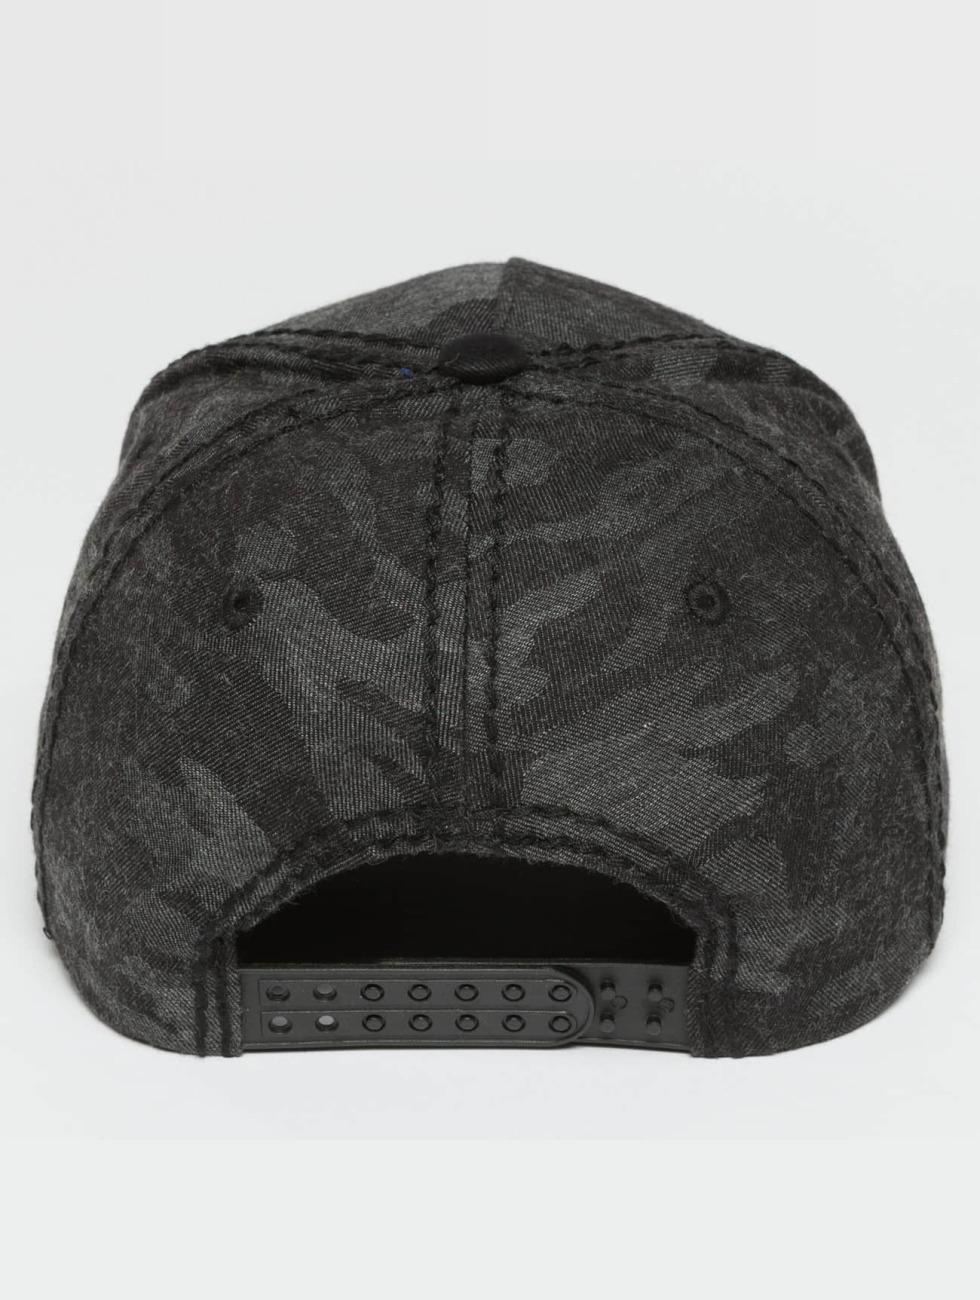 Von Dutch Casquette Snapback & Strapback VD0CAS1 gris